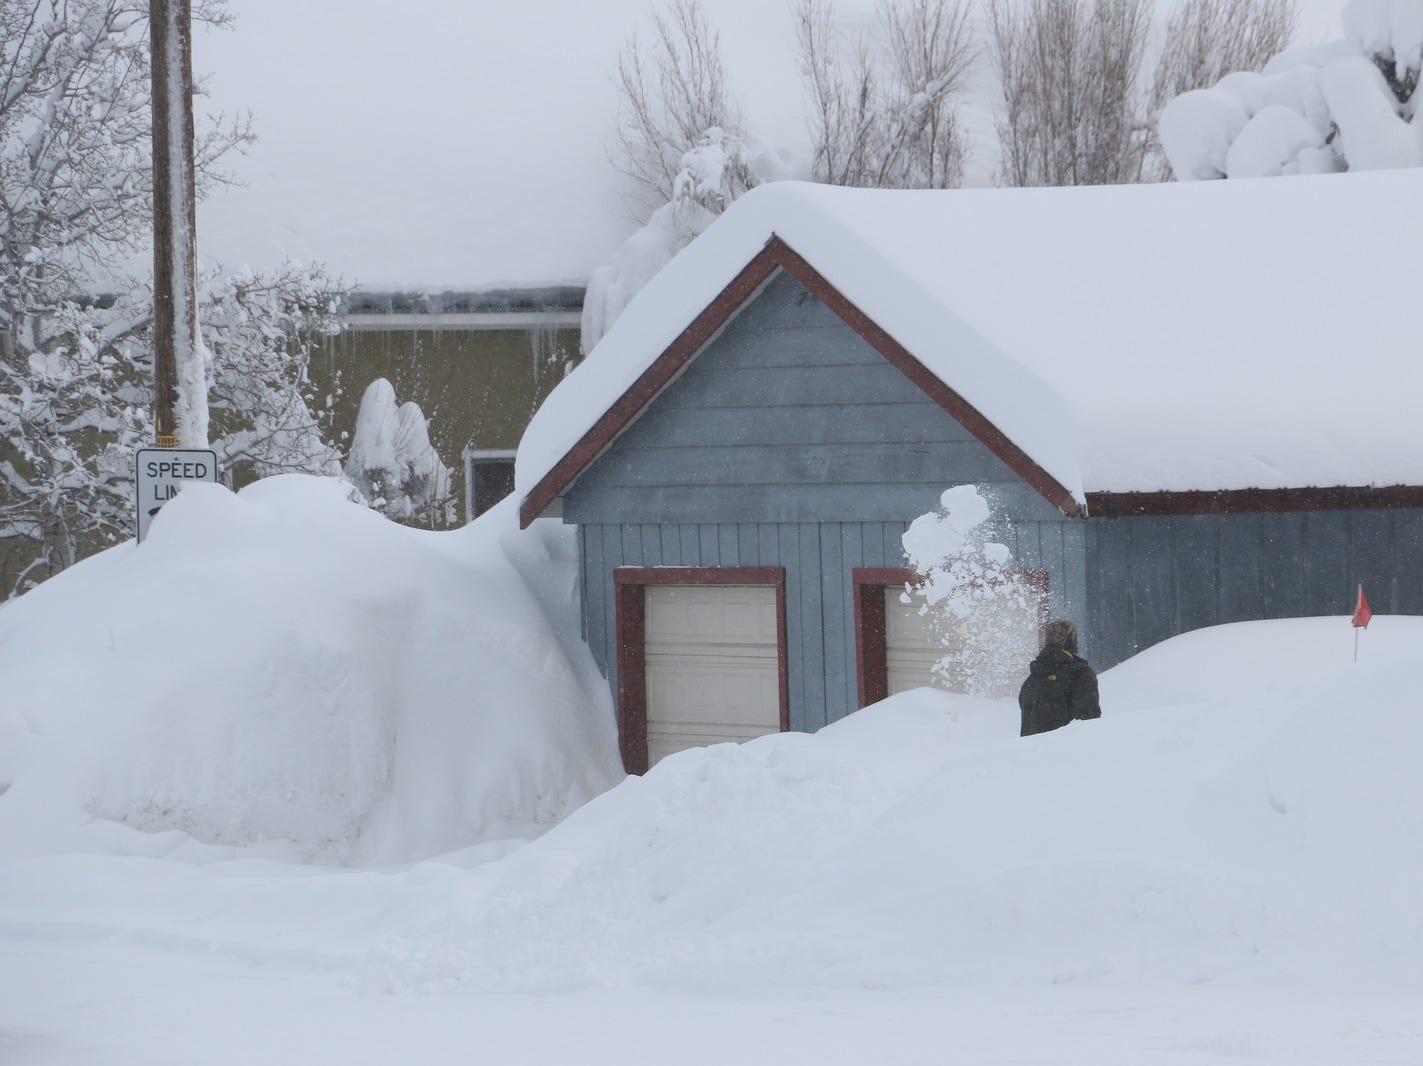 Snowy scenes are seen in Truckee, Calif. on Feb. 16, 2019.